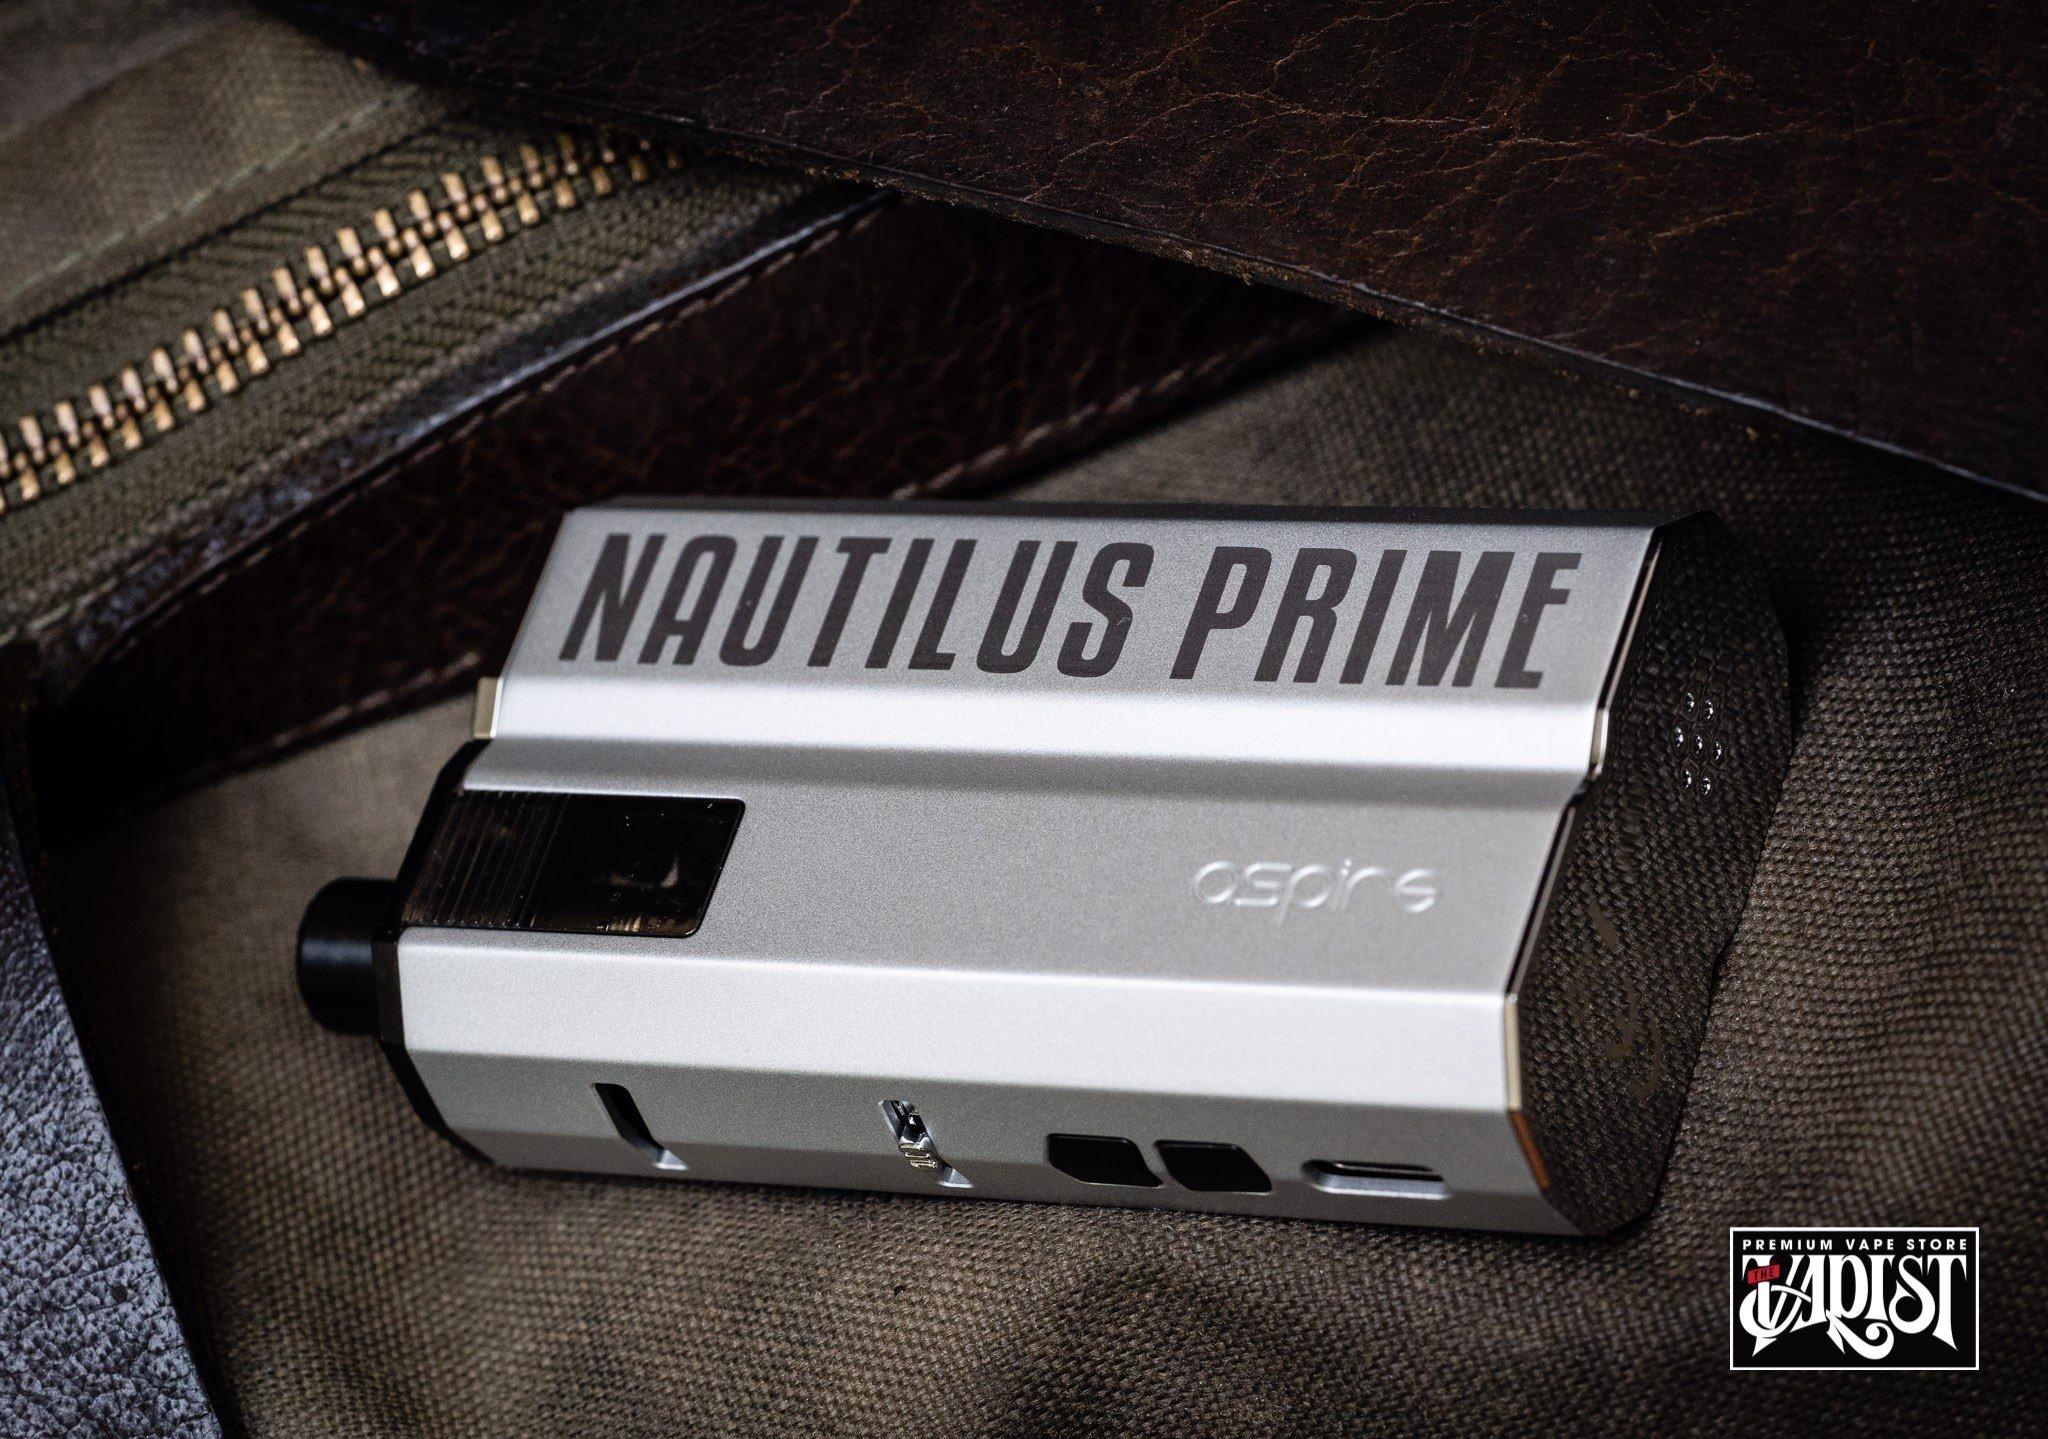 Nautilus Prime by Aspire